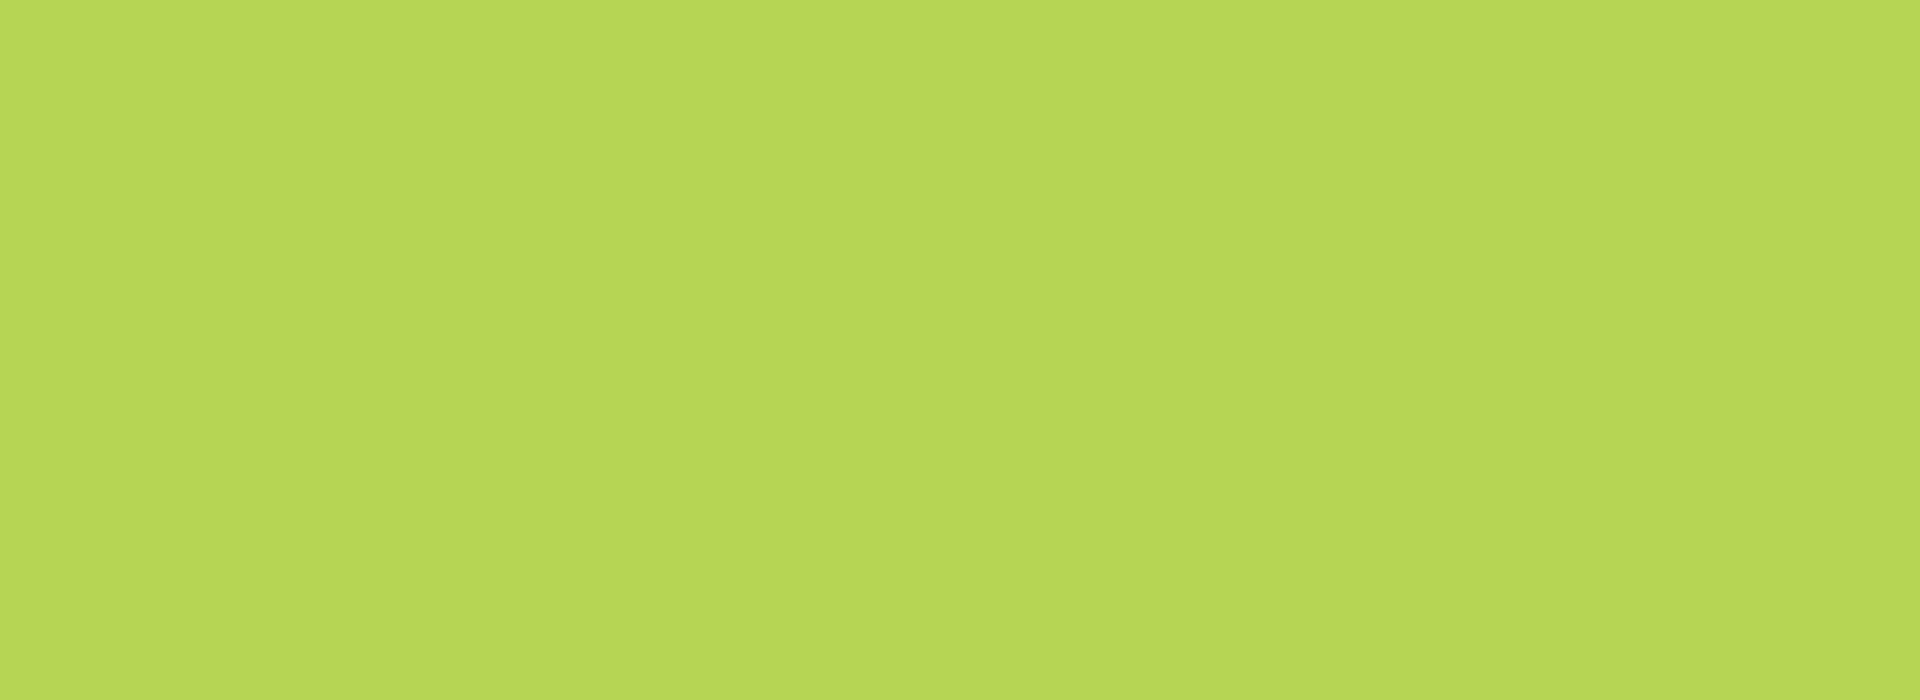 big green rectangle